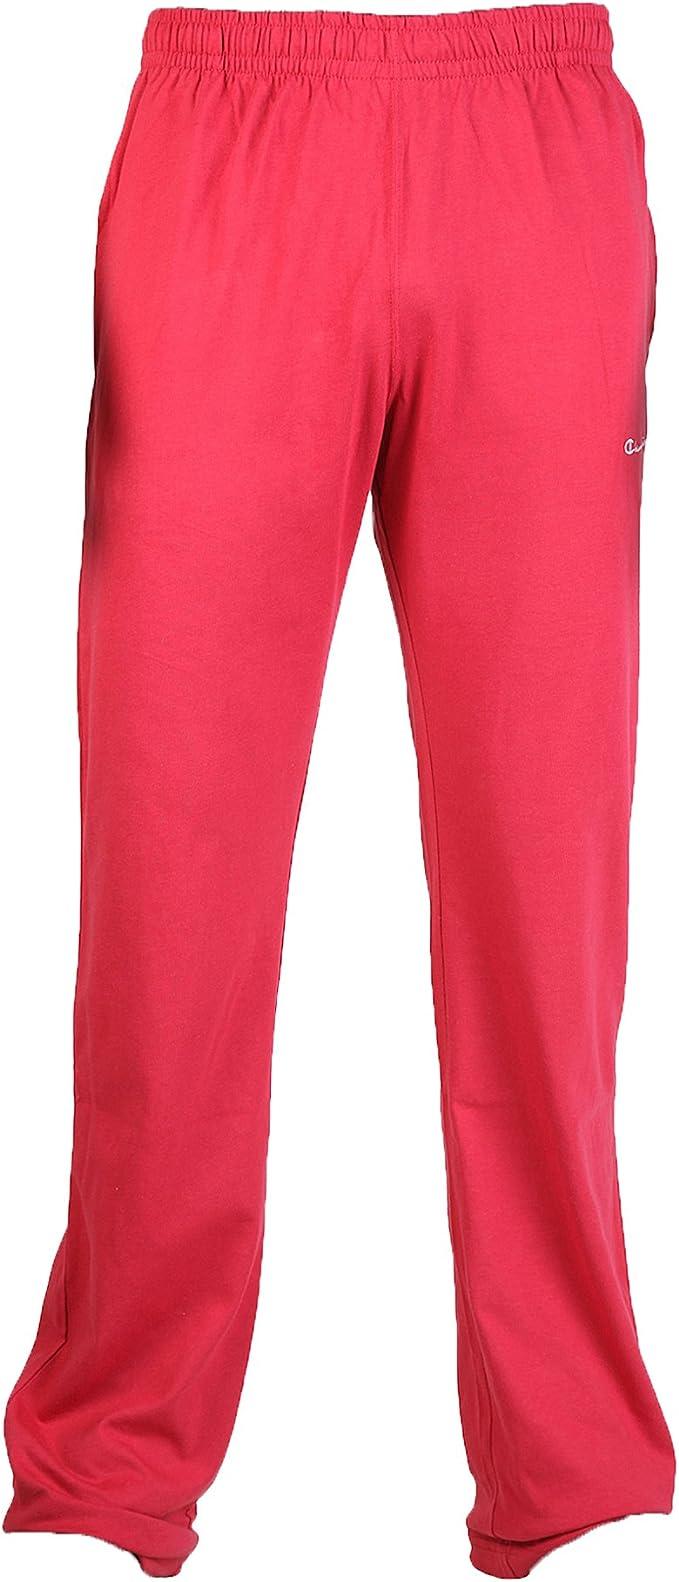 Champion - Pantalones Chandal Casual diseño Liso Caballero Hombre ...